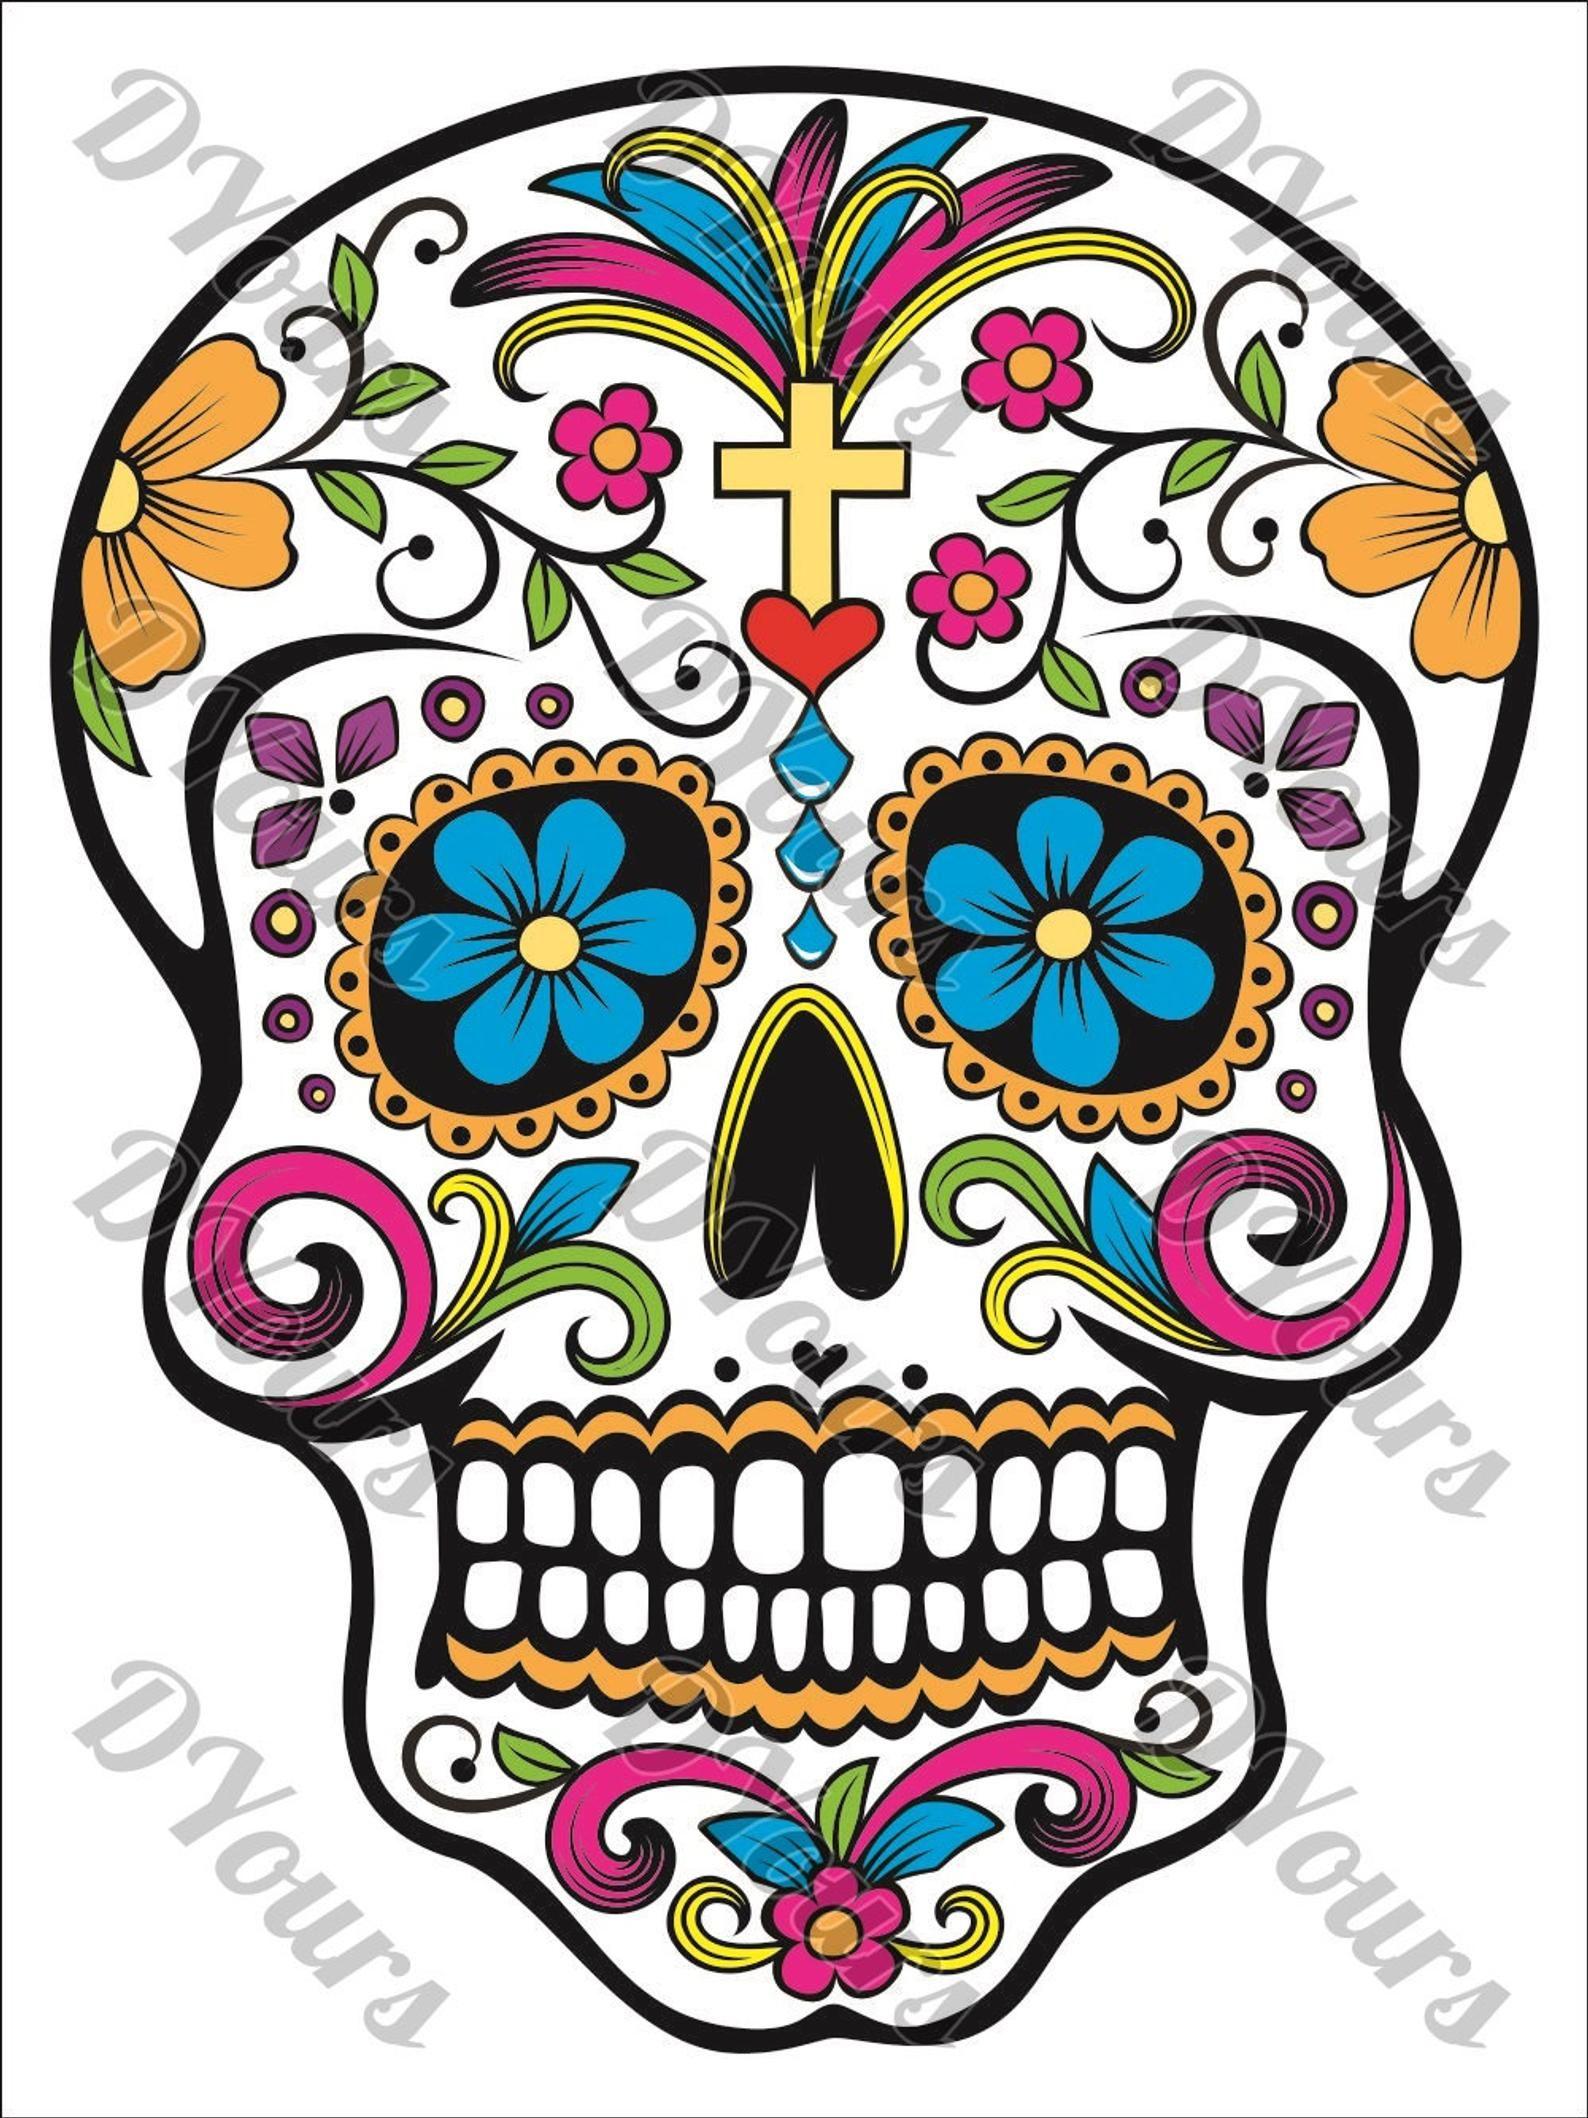 - Sugar Skull Fully Coloured Mexican Day Of The Dead Skull Etsy